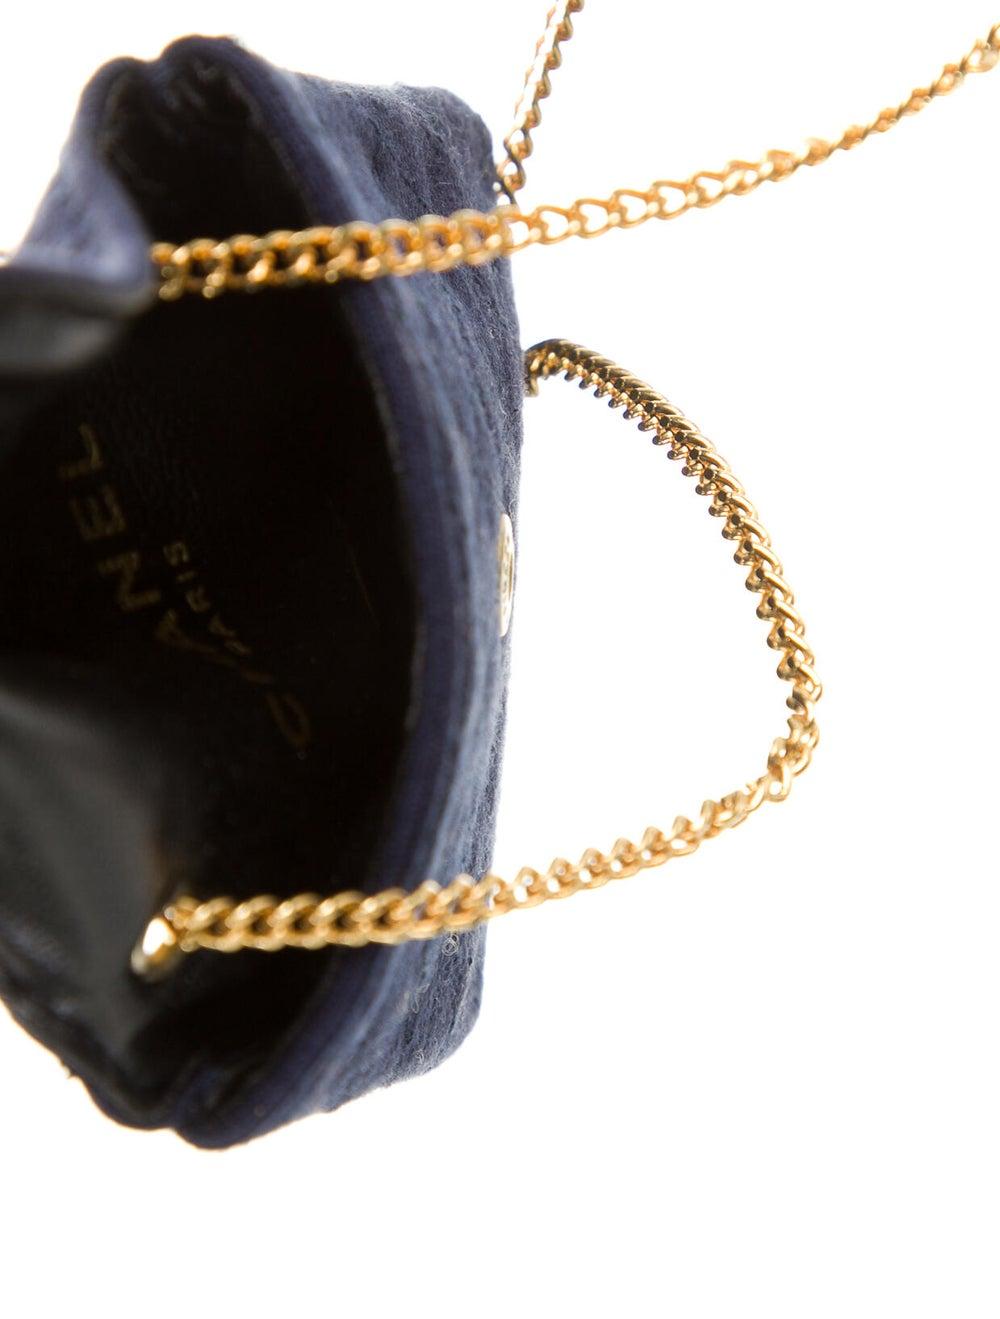 Chanel Vintage Jersey Micro Flap Bag Blue - image 5